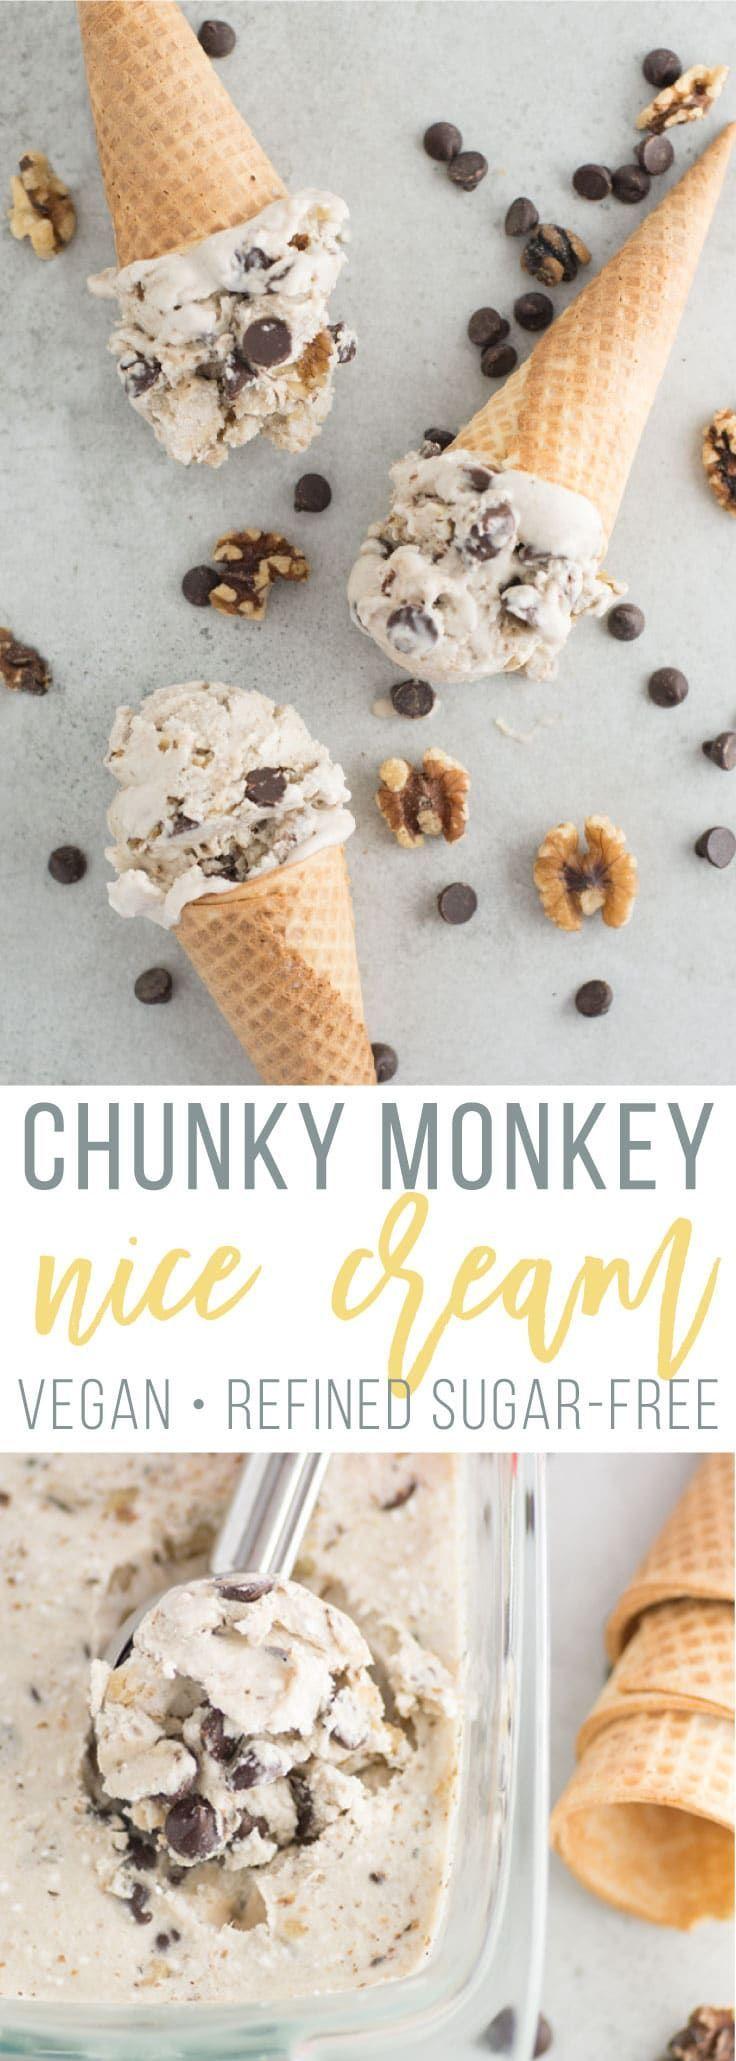 Chunky Monkey Banana Nice Cream This Vegan Dessert Is So Easy To Make And No Churn Required Pack In 2020 Nice Cream Recipe Banana Nice Cream Vegan Ice Cream Recipe